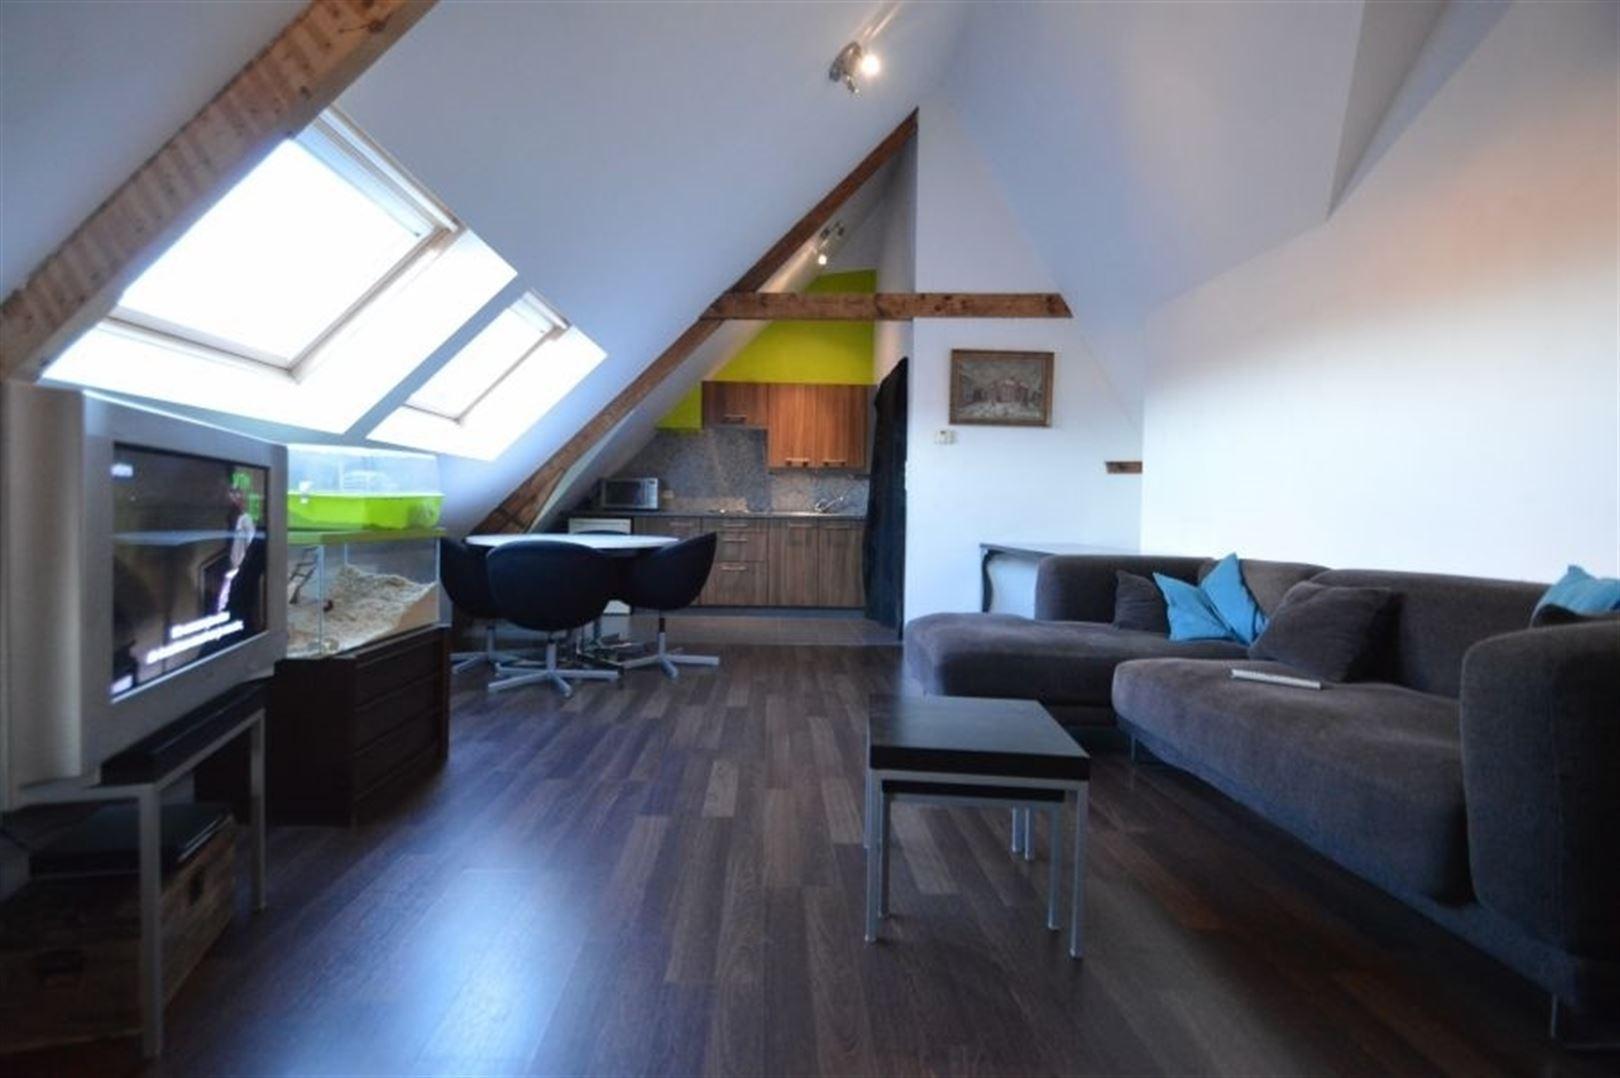 Foto 6 : Appartement te 9200 Dendermonde (België) - Prijs € 470